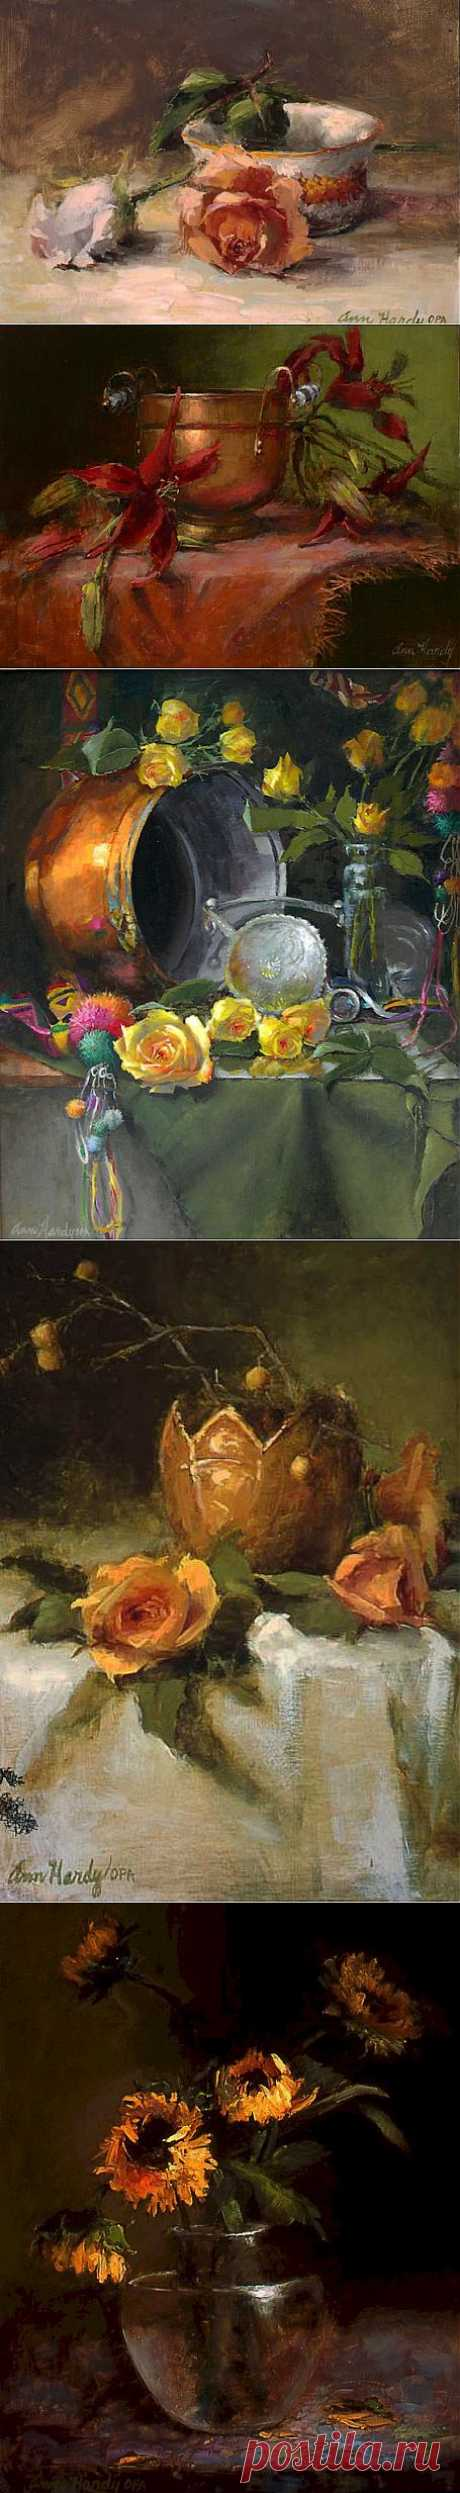 Художница Ann Hardy   Искусство